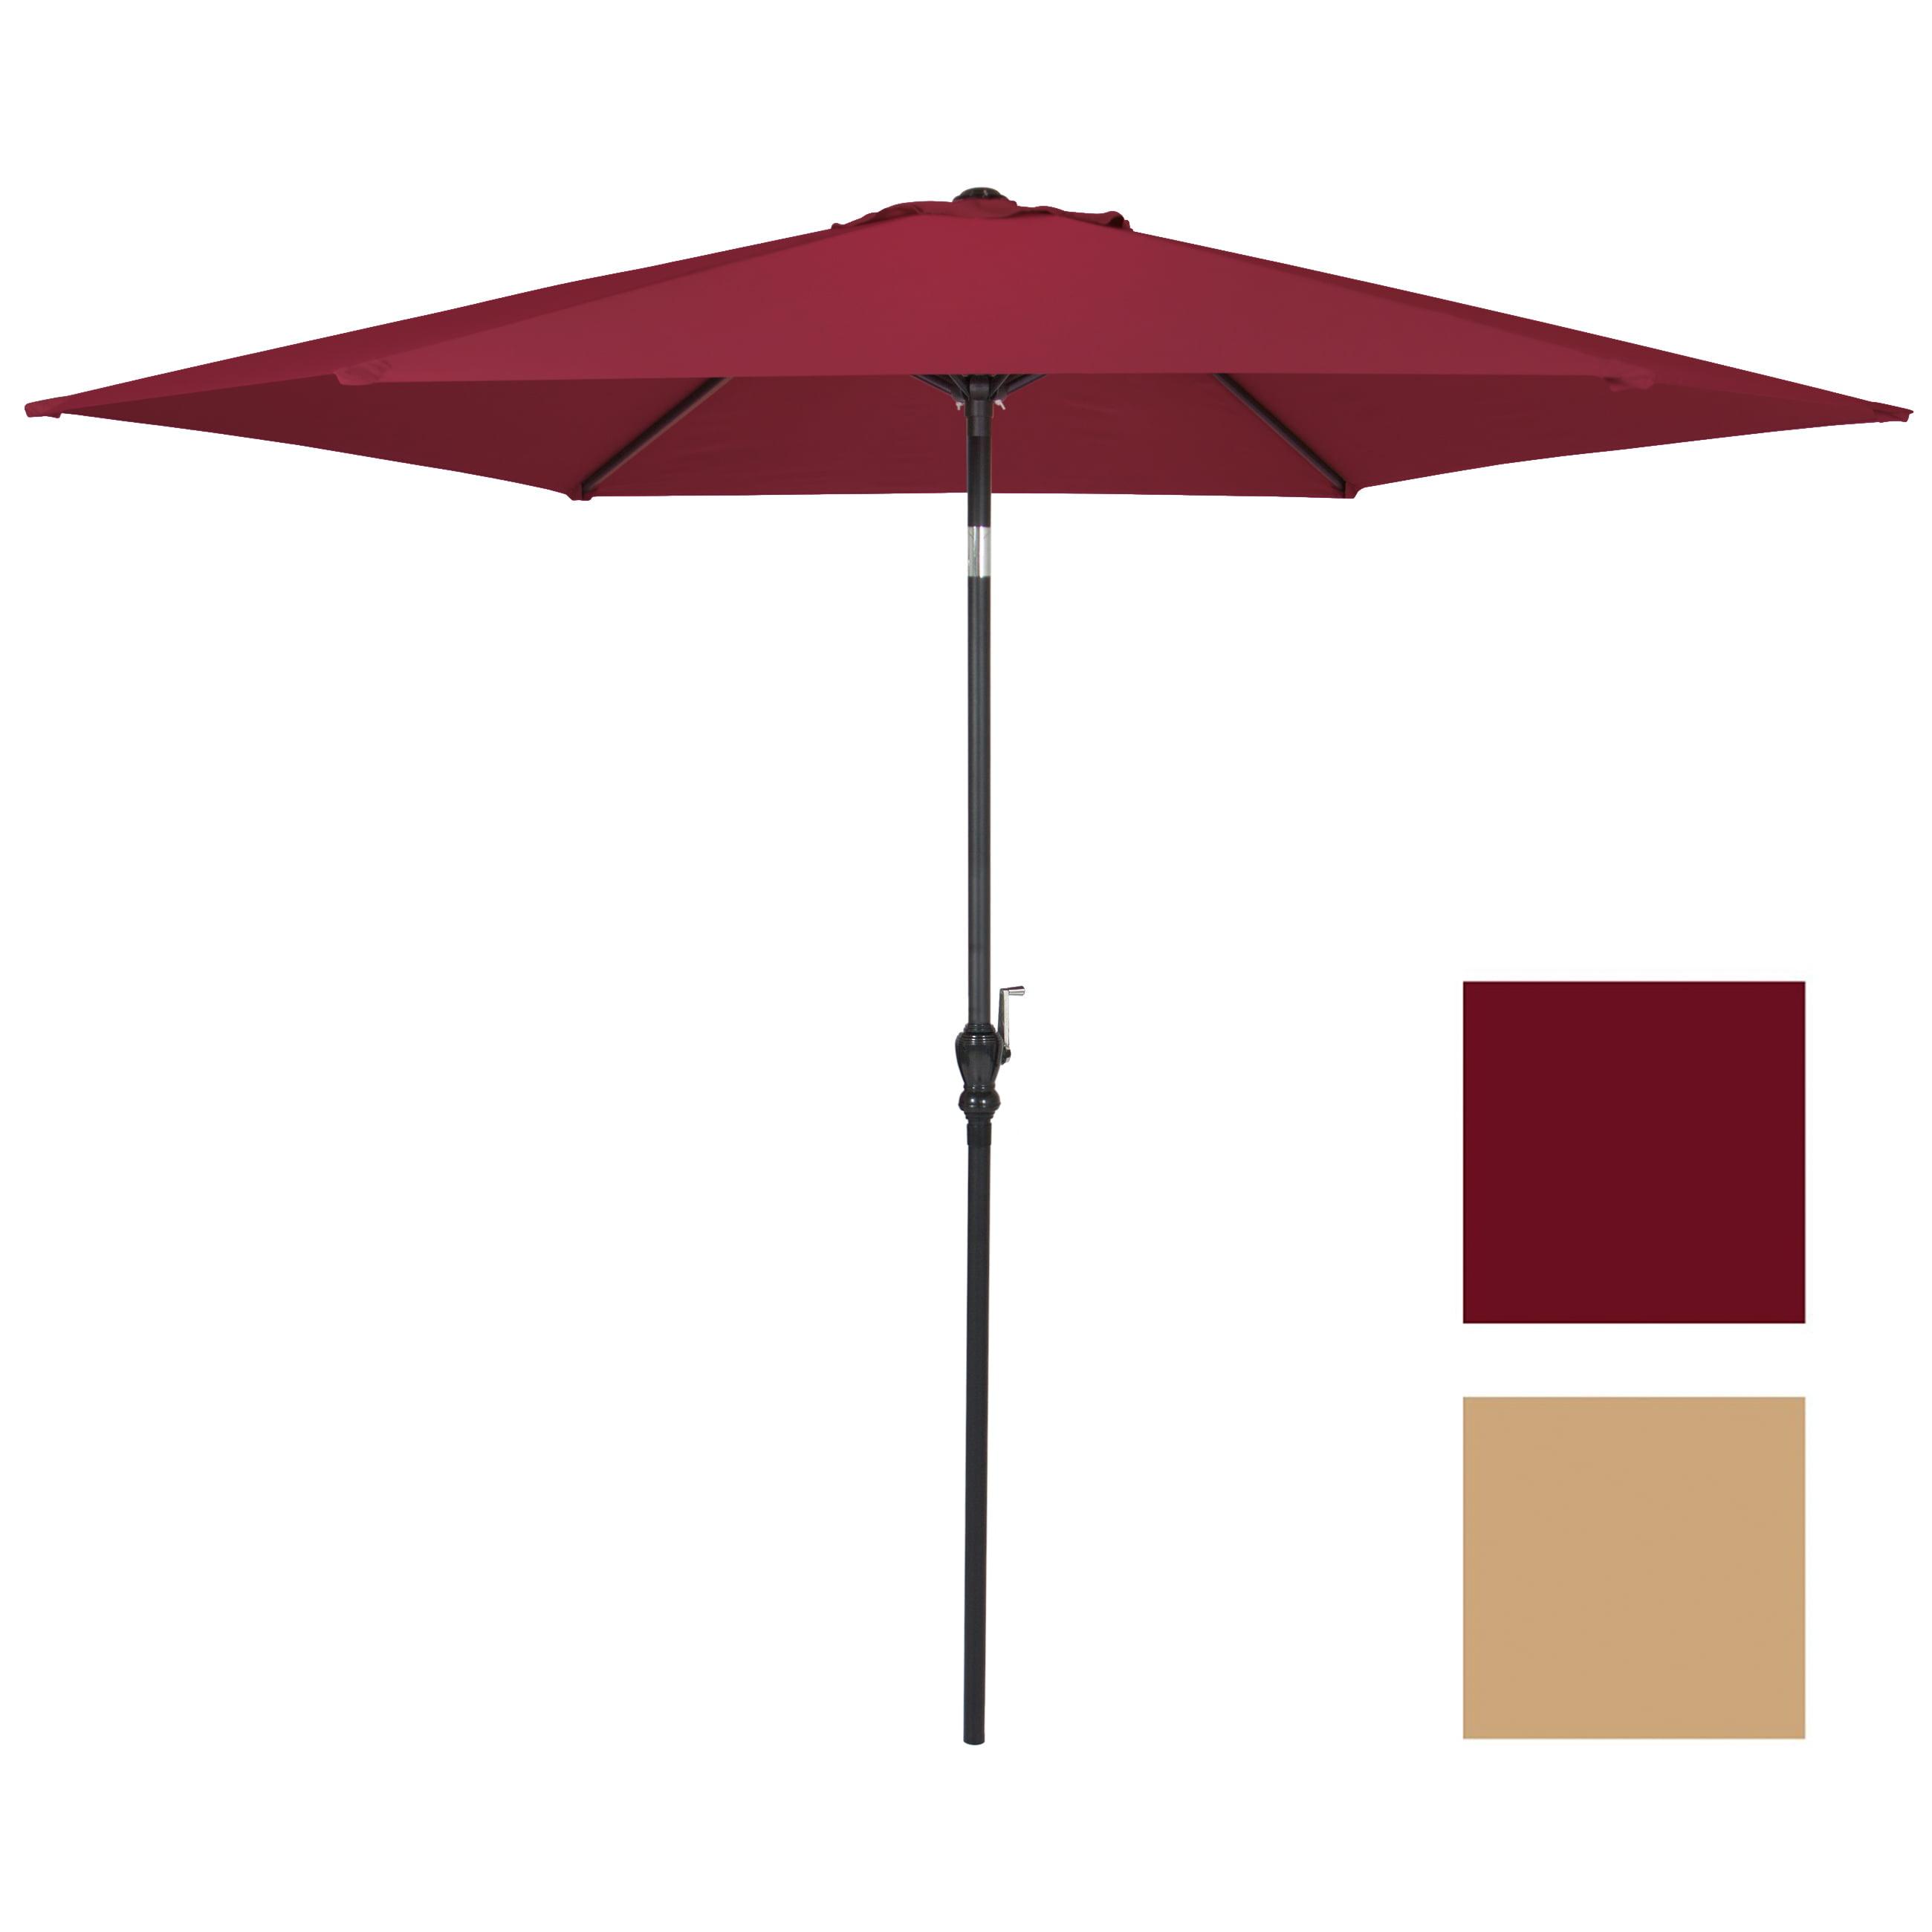 Best Choice Products 10 FT Steel Market Outdoor Patio Umbrella W  Crank, Tilt Push Button-... by